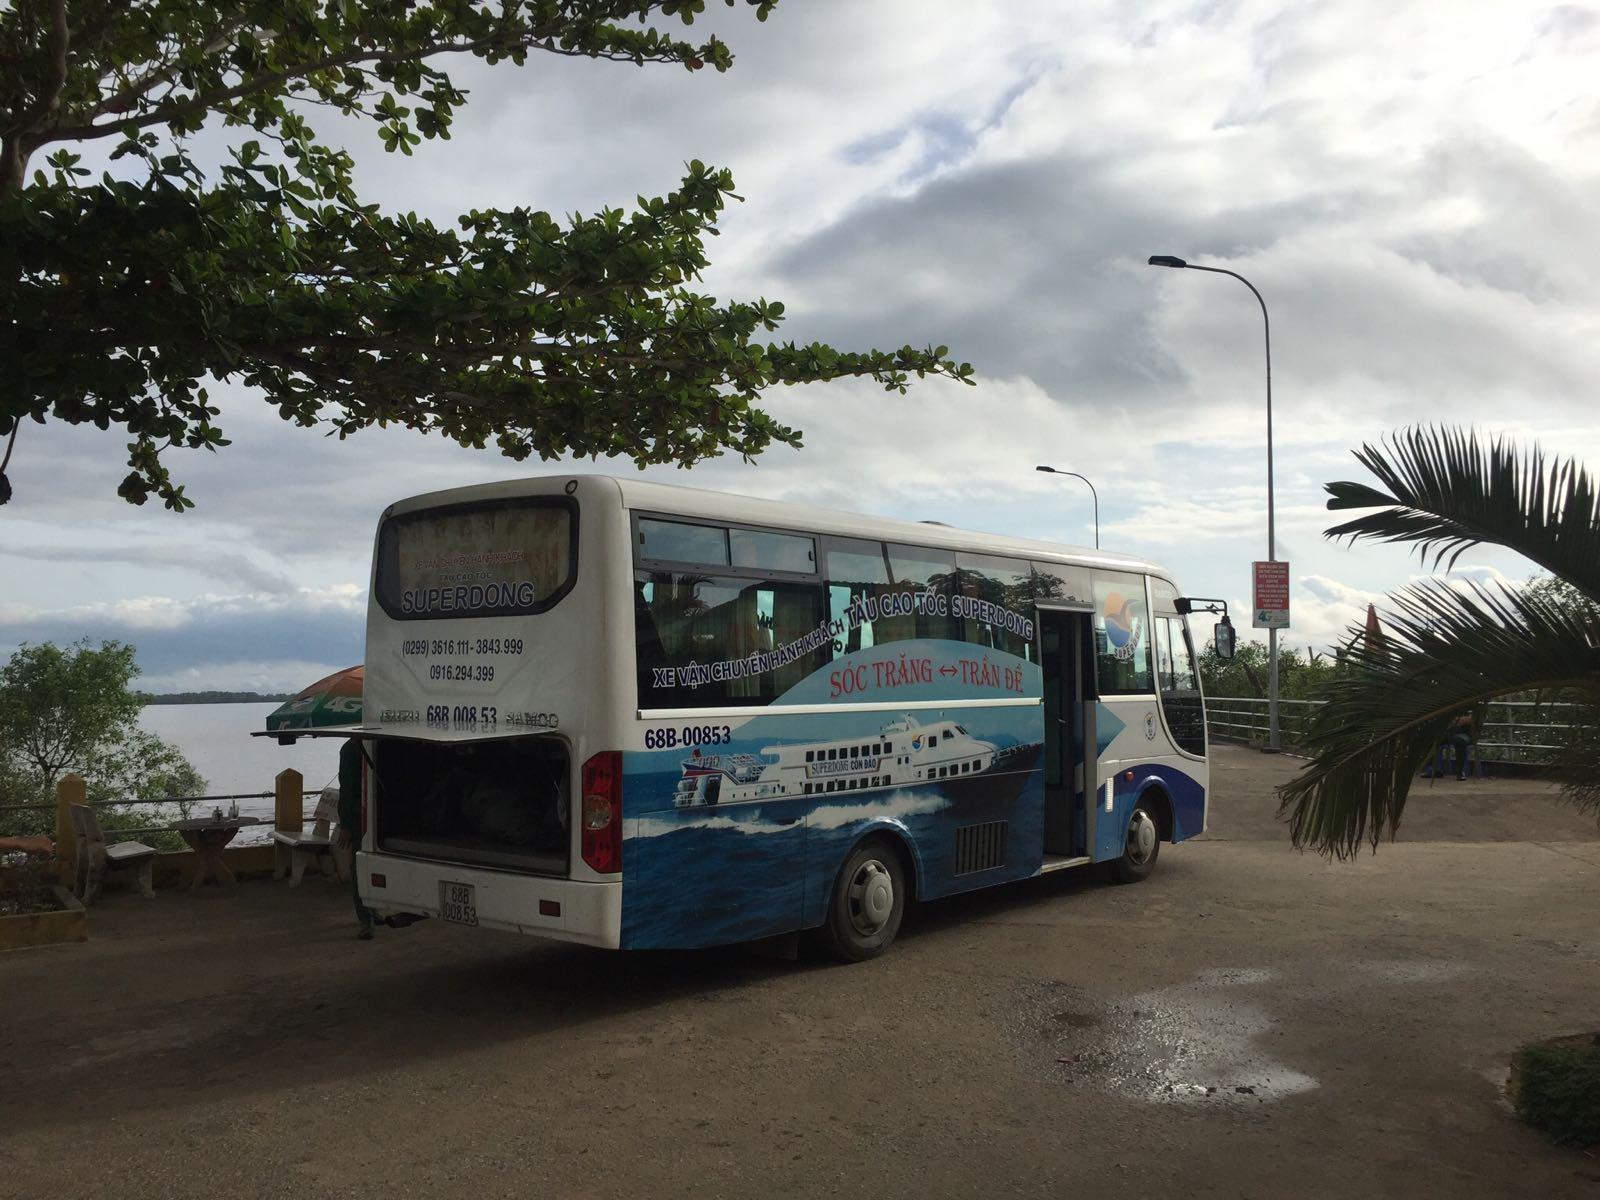 Superdong Bus